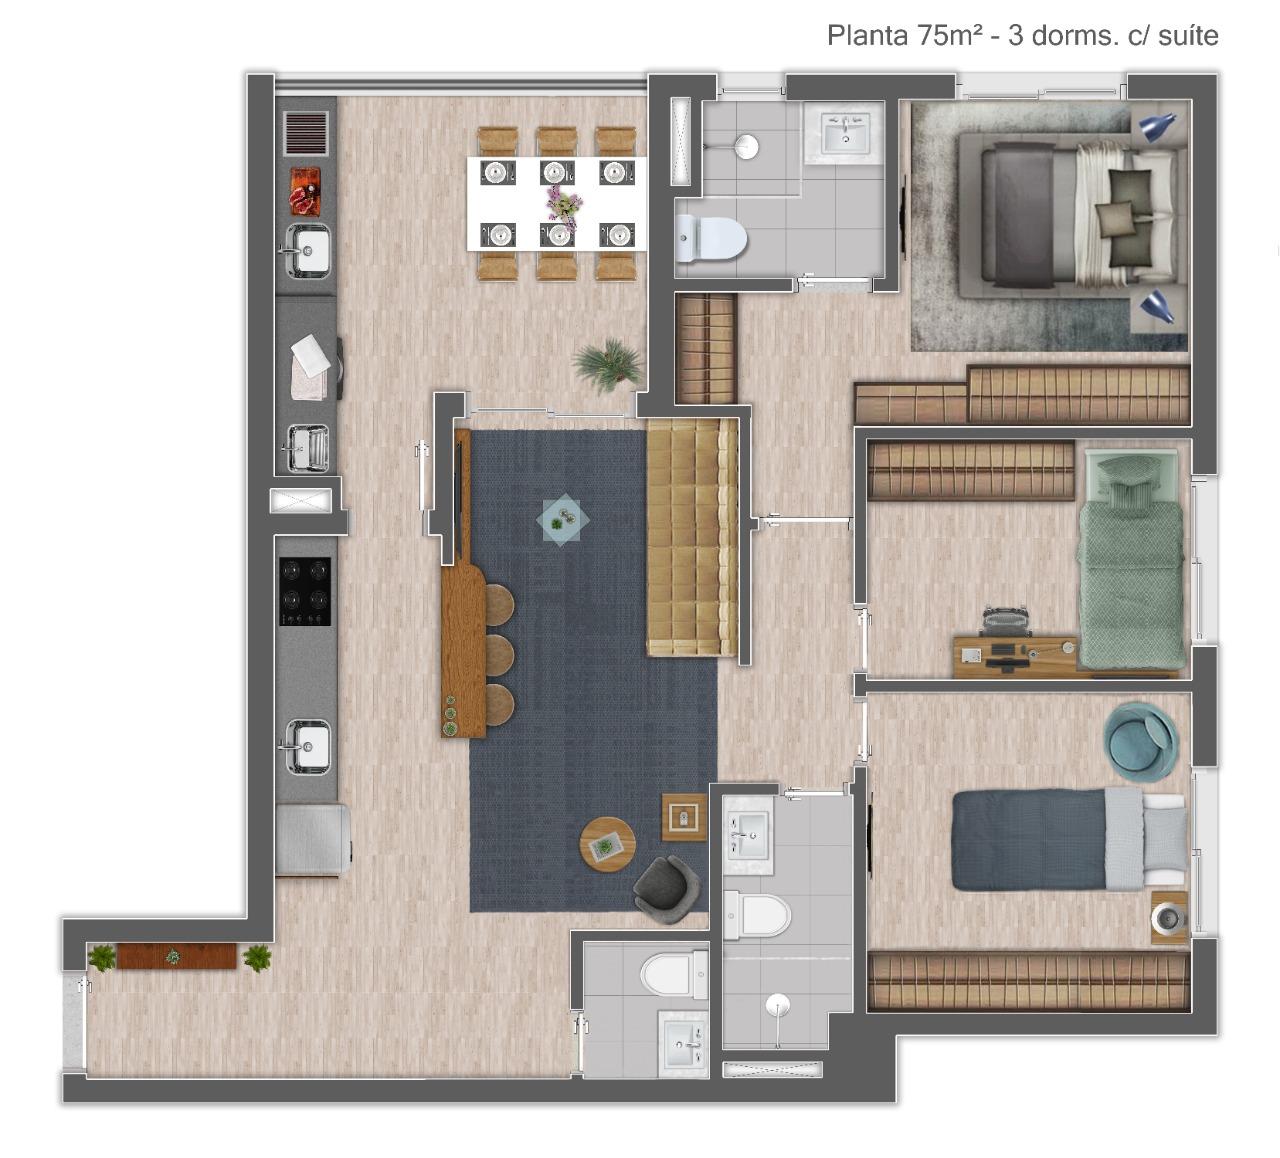 Planta 75m² - 3 Dorms.